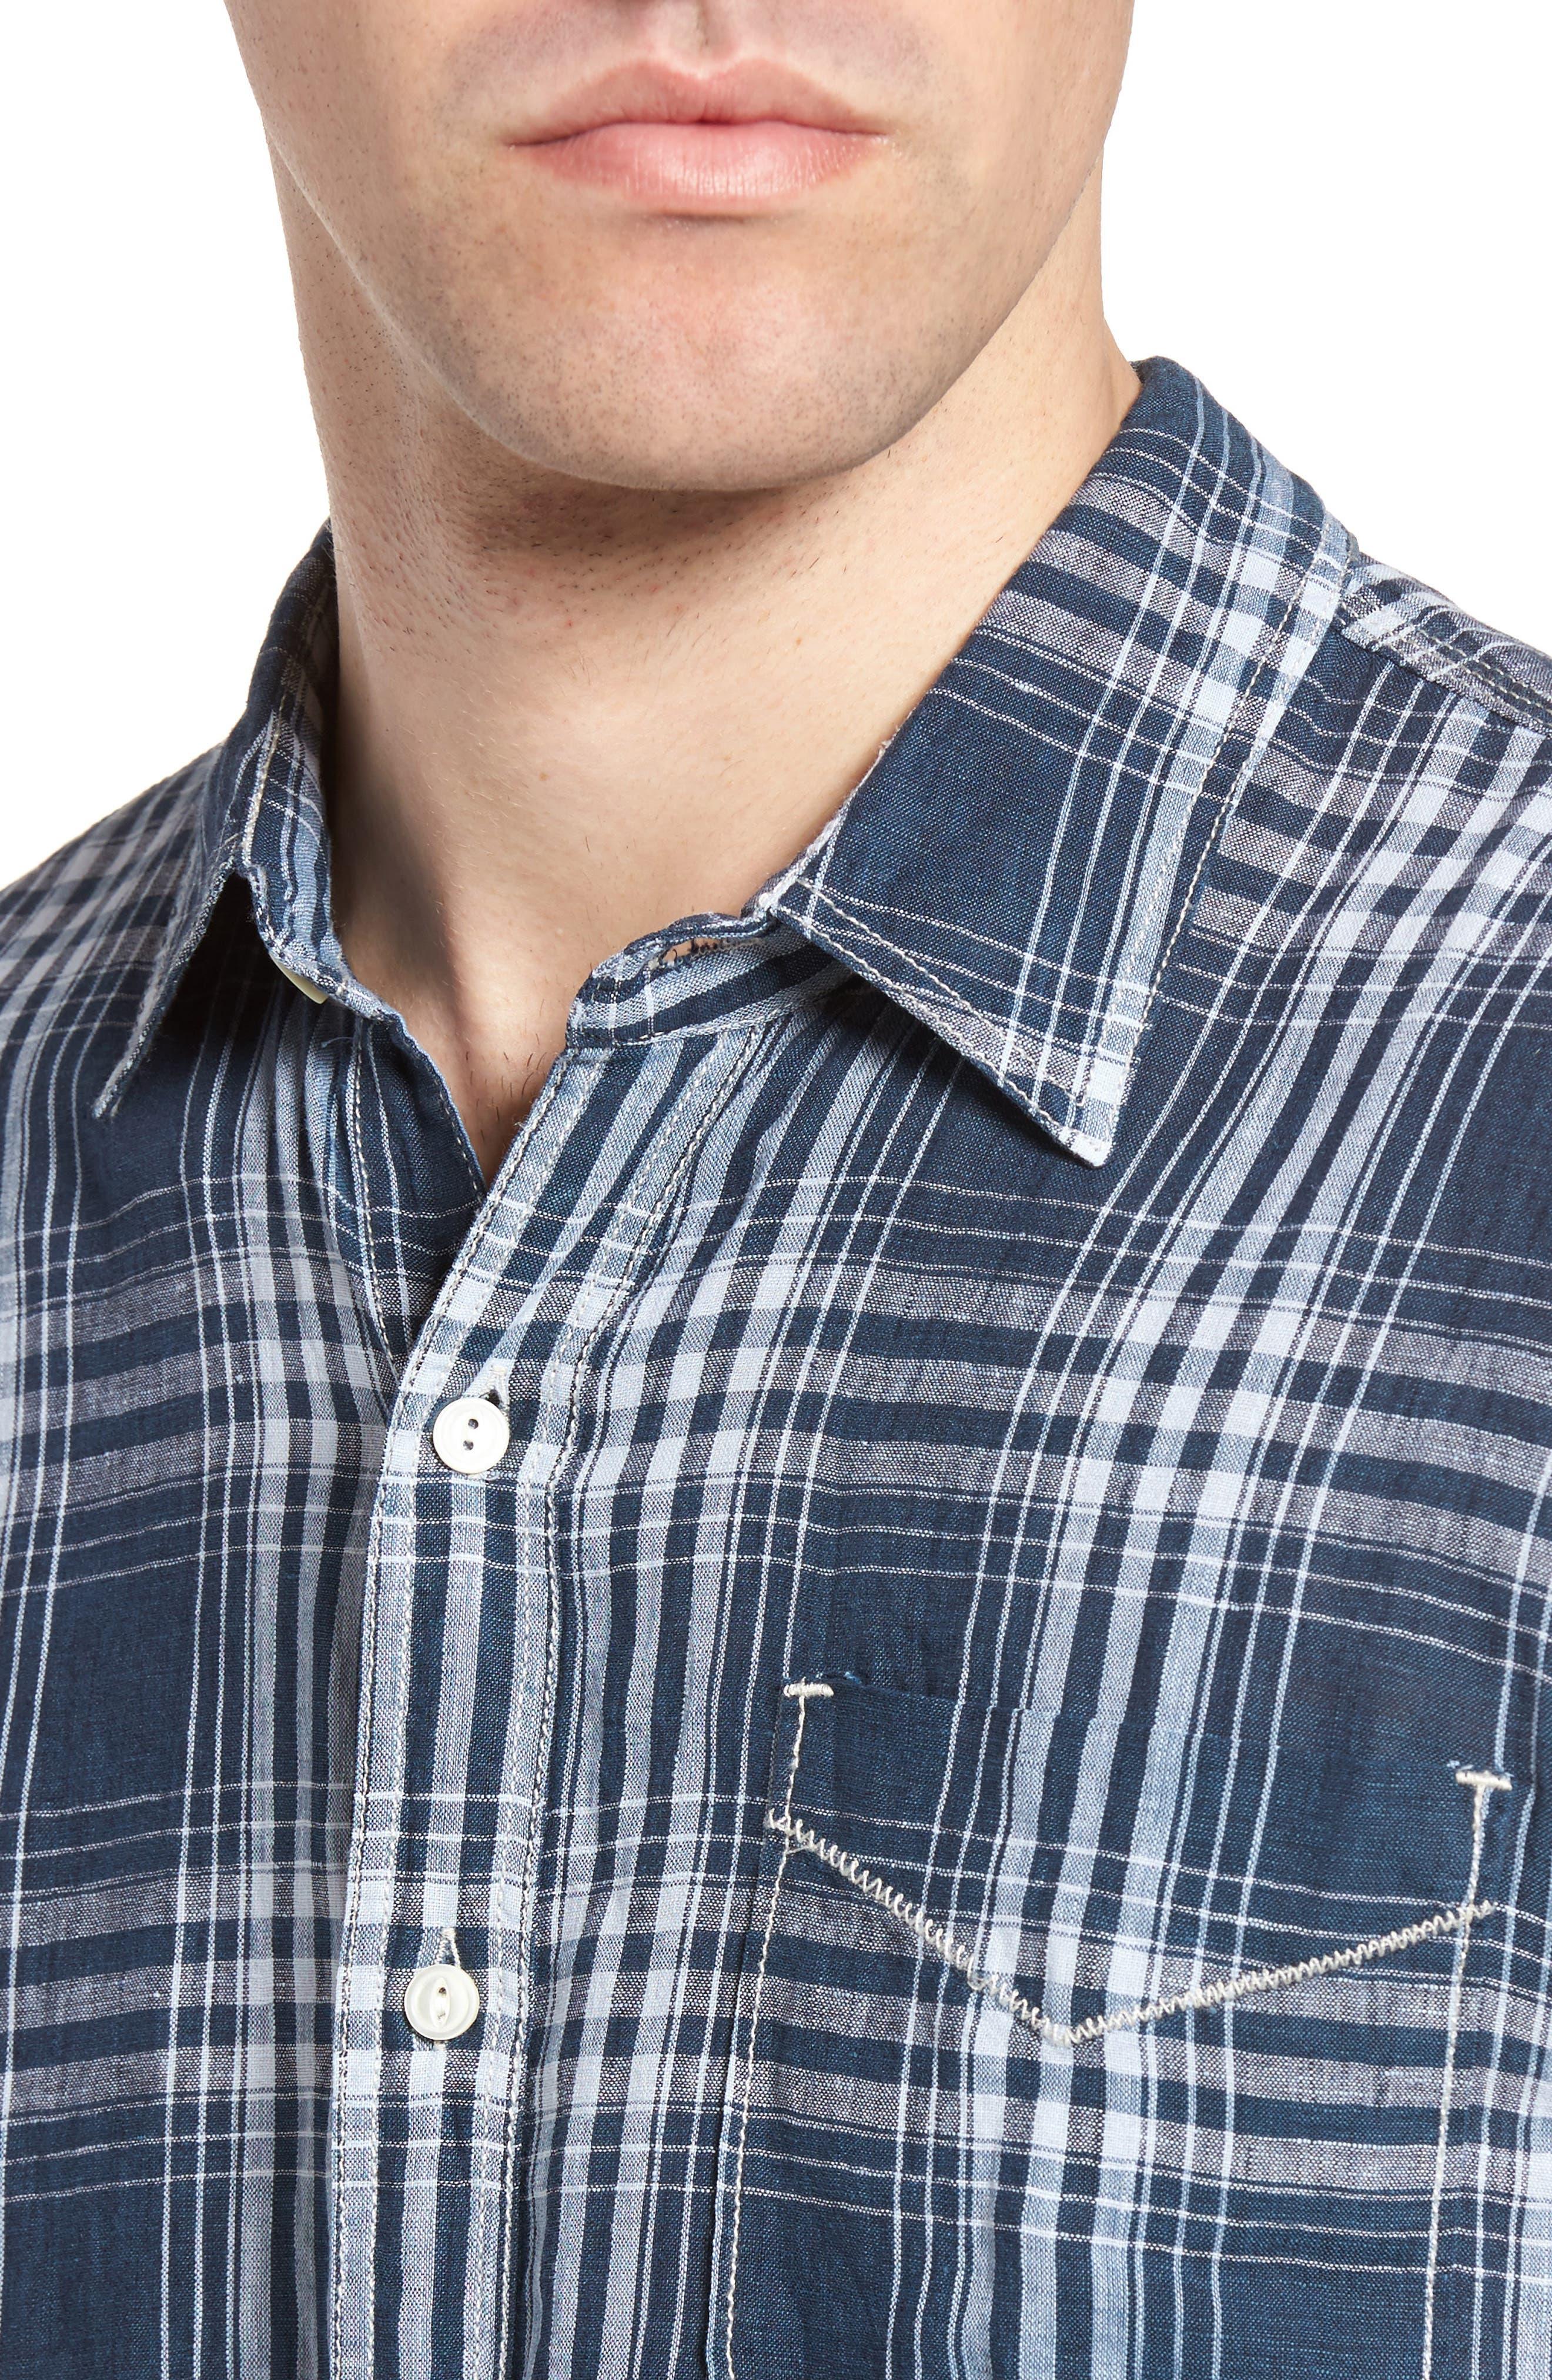 Indigo Plaid Sport Shirt,                             Alternate thumbnail 4, color,                             405